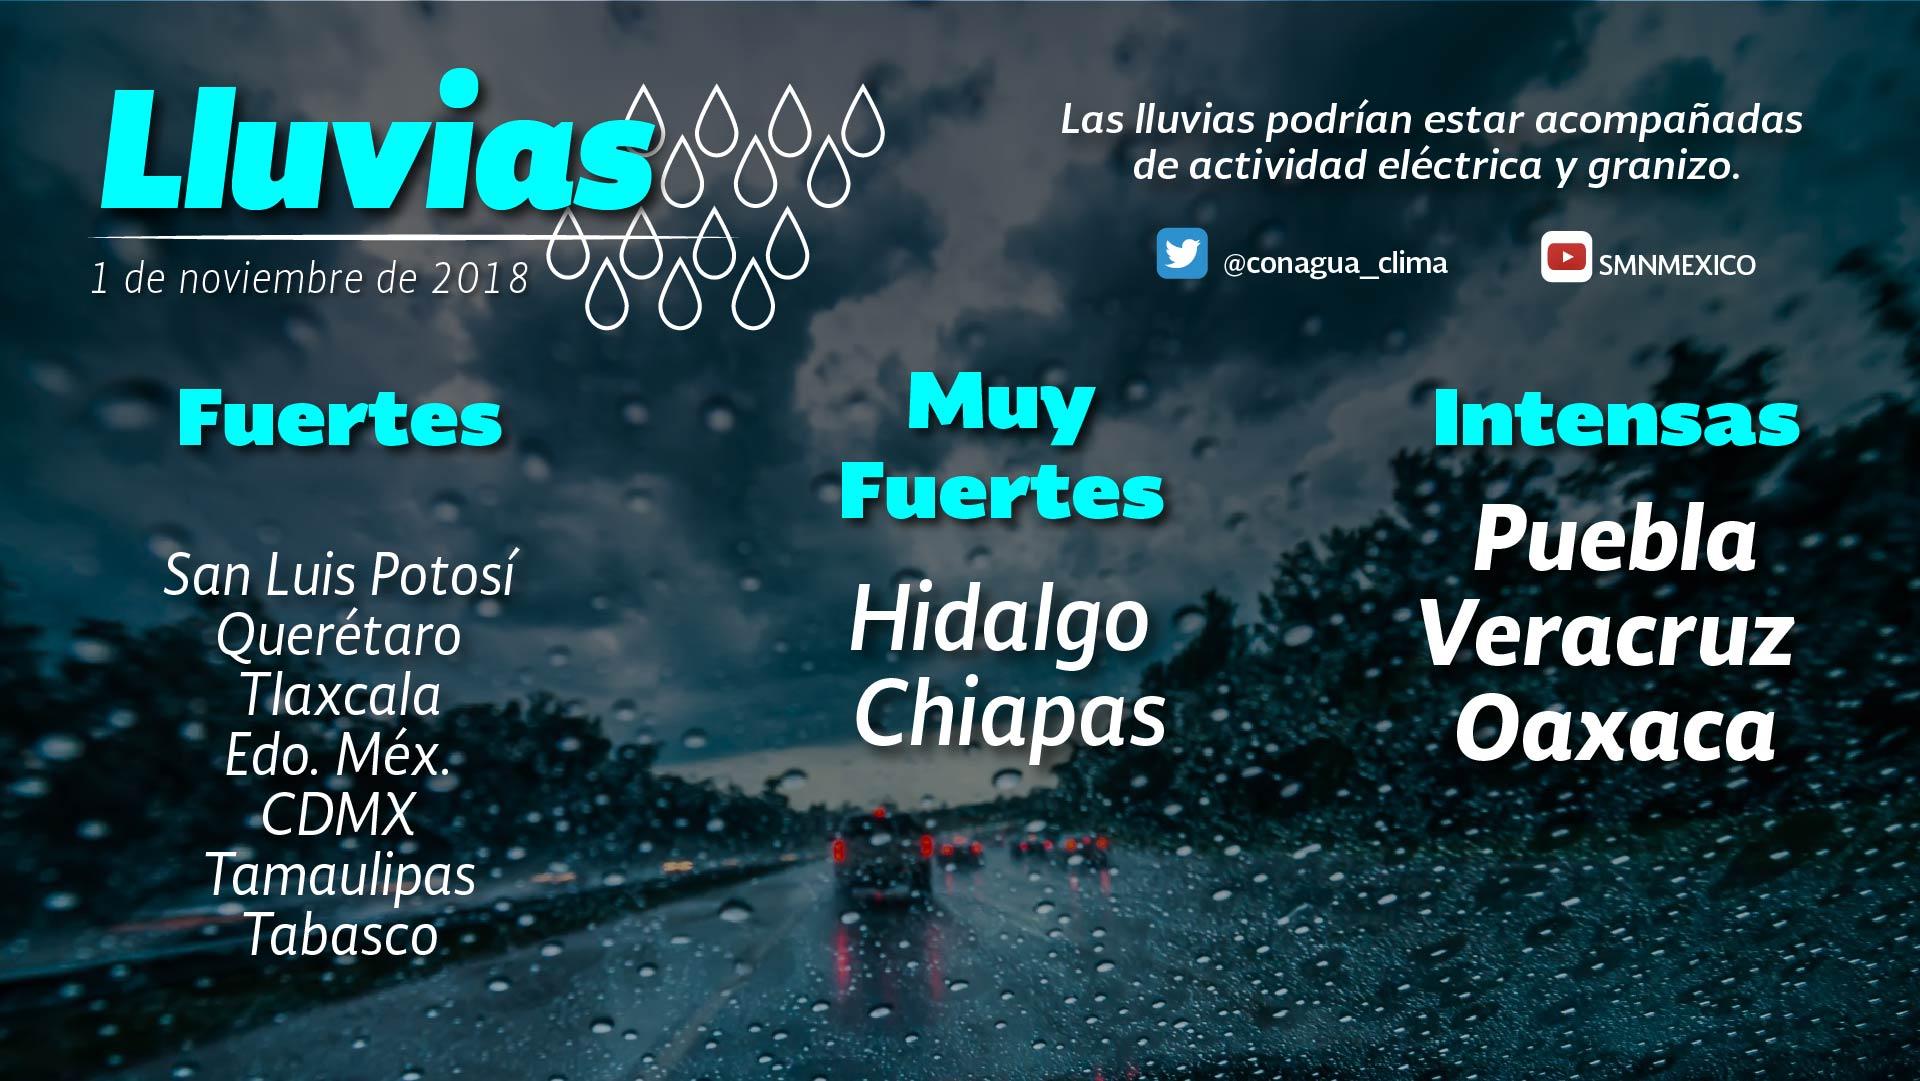 Se prevén tormentas puntuales fuertes para Tlaxcala